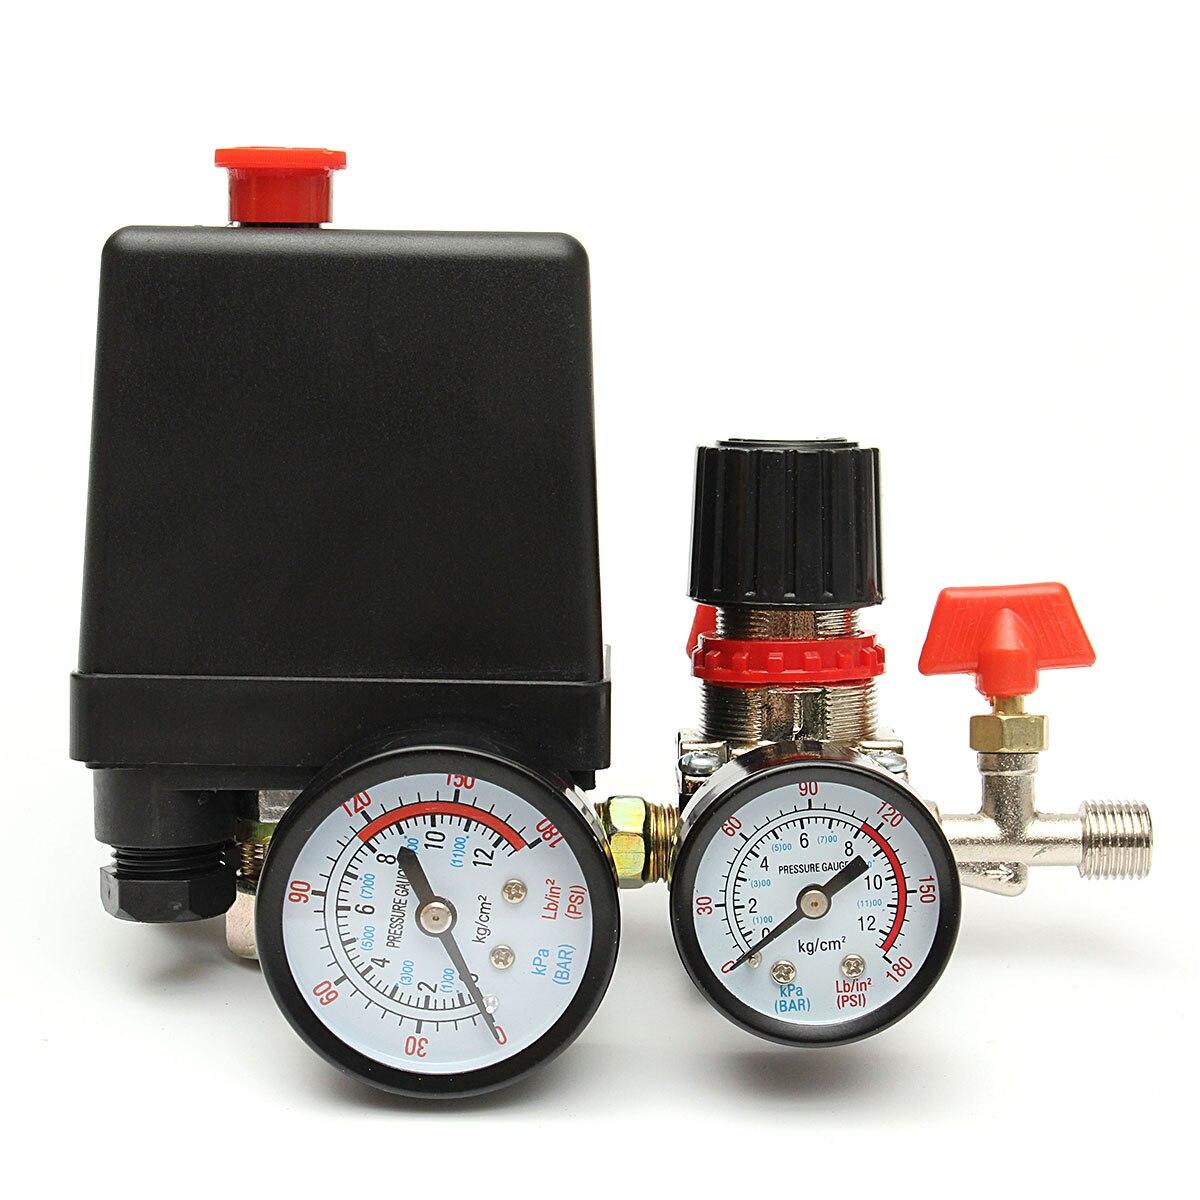 240V AC Regulator Heavy   Air Compressor Pump Pressure Control Switch 4 Port Air Pump Control Valve 7.25-125 PSI With Gauge240V AC Regulator Heavy   Air Compressor Pump Pressure Control Switch 4 Port Air Pump Control Valve 7.25-125 PSI With Gauge